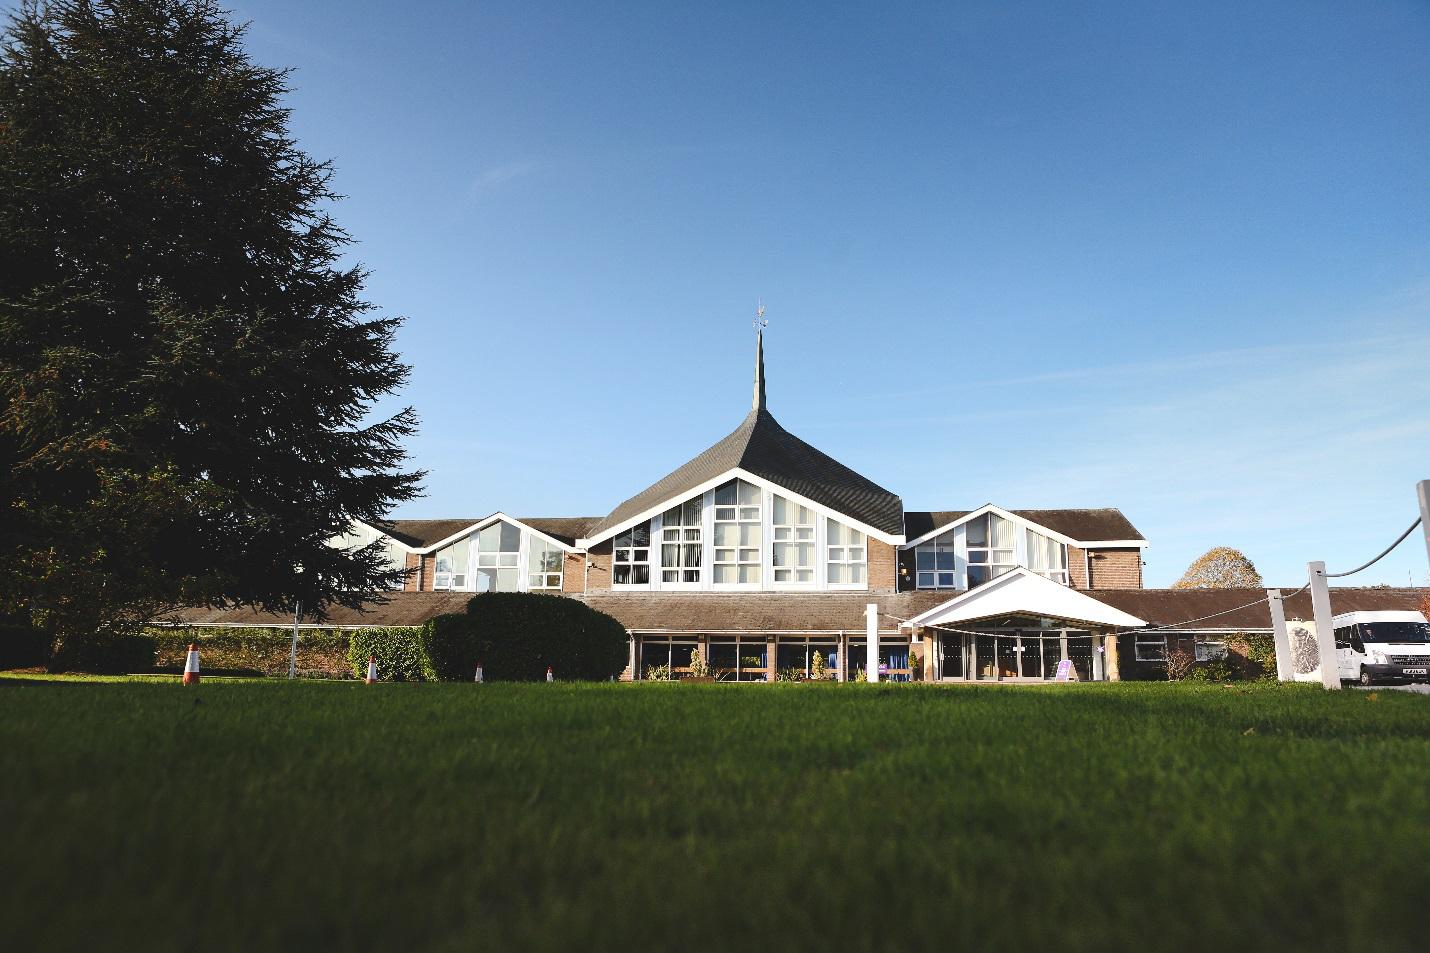 Perse是英国剑桥的顶级私立学校,在苏州首次与张在苏州的股份合并